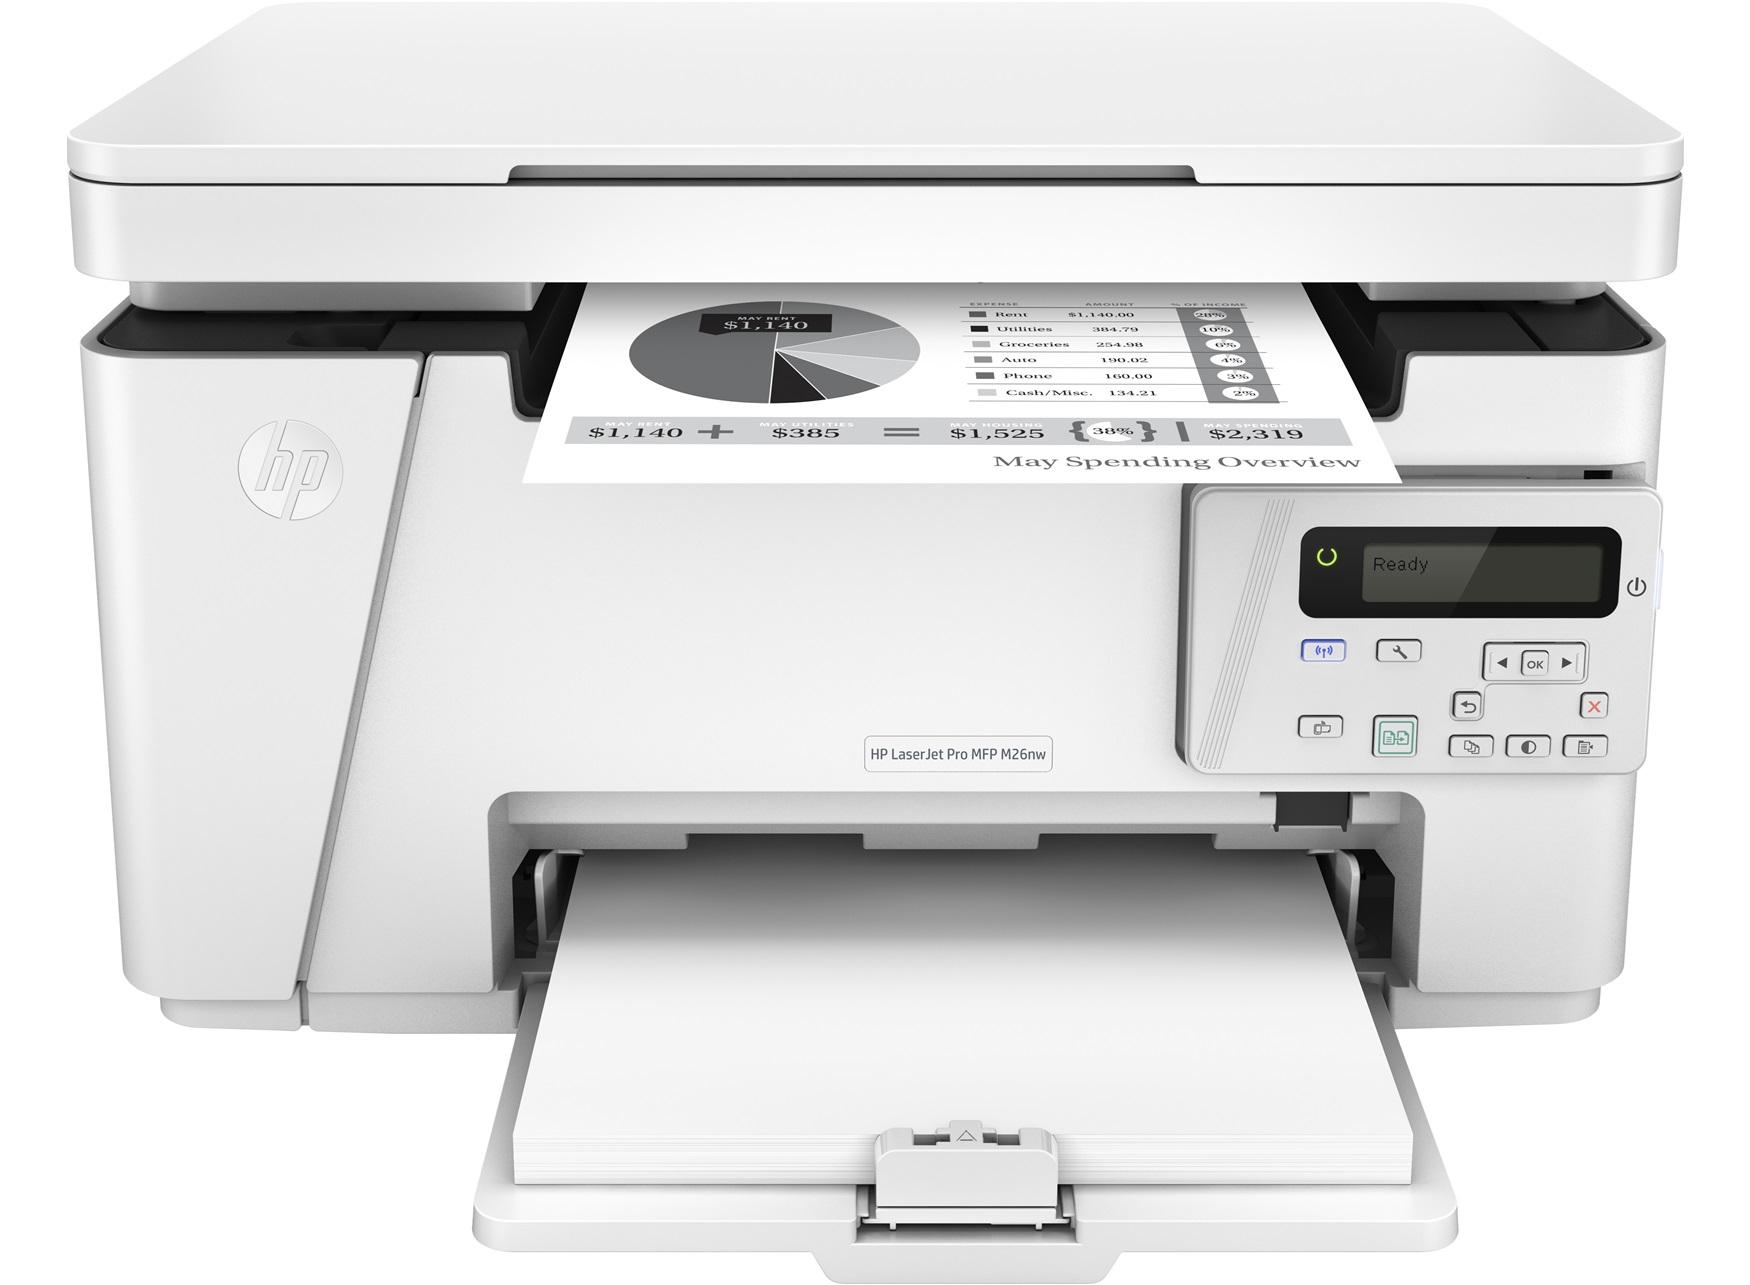 HP LaserJet Pro M26NW All-in-One Wi-Fi Mono Laser Printer - £79.99 @ Argos (+£40 Cashback)